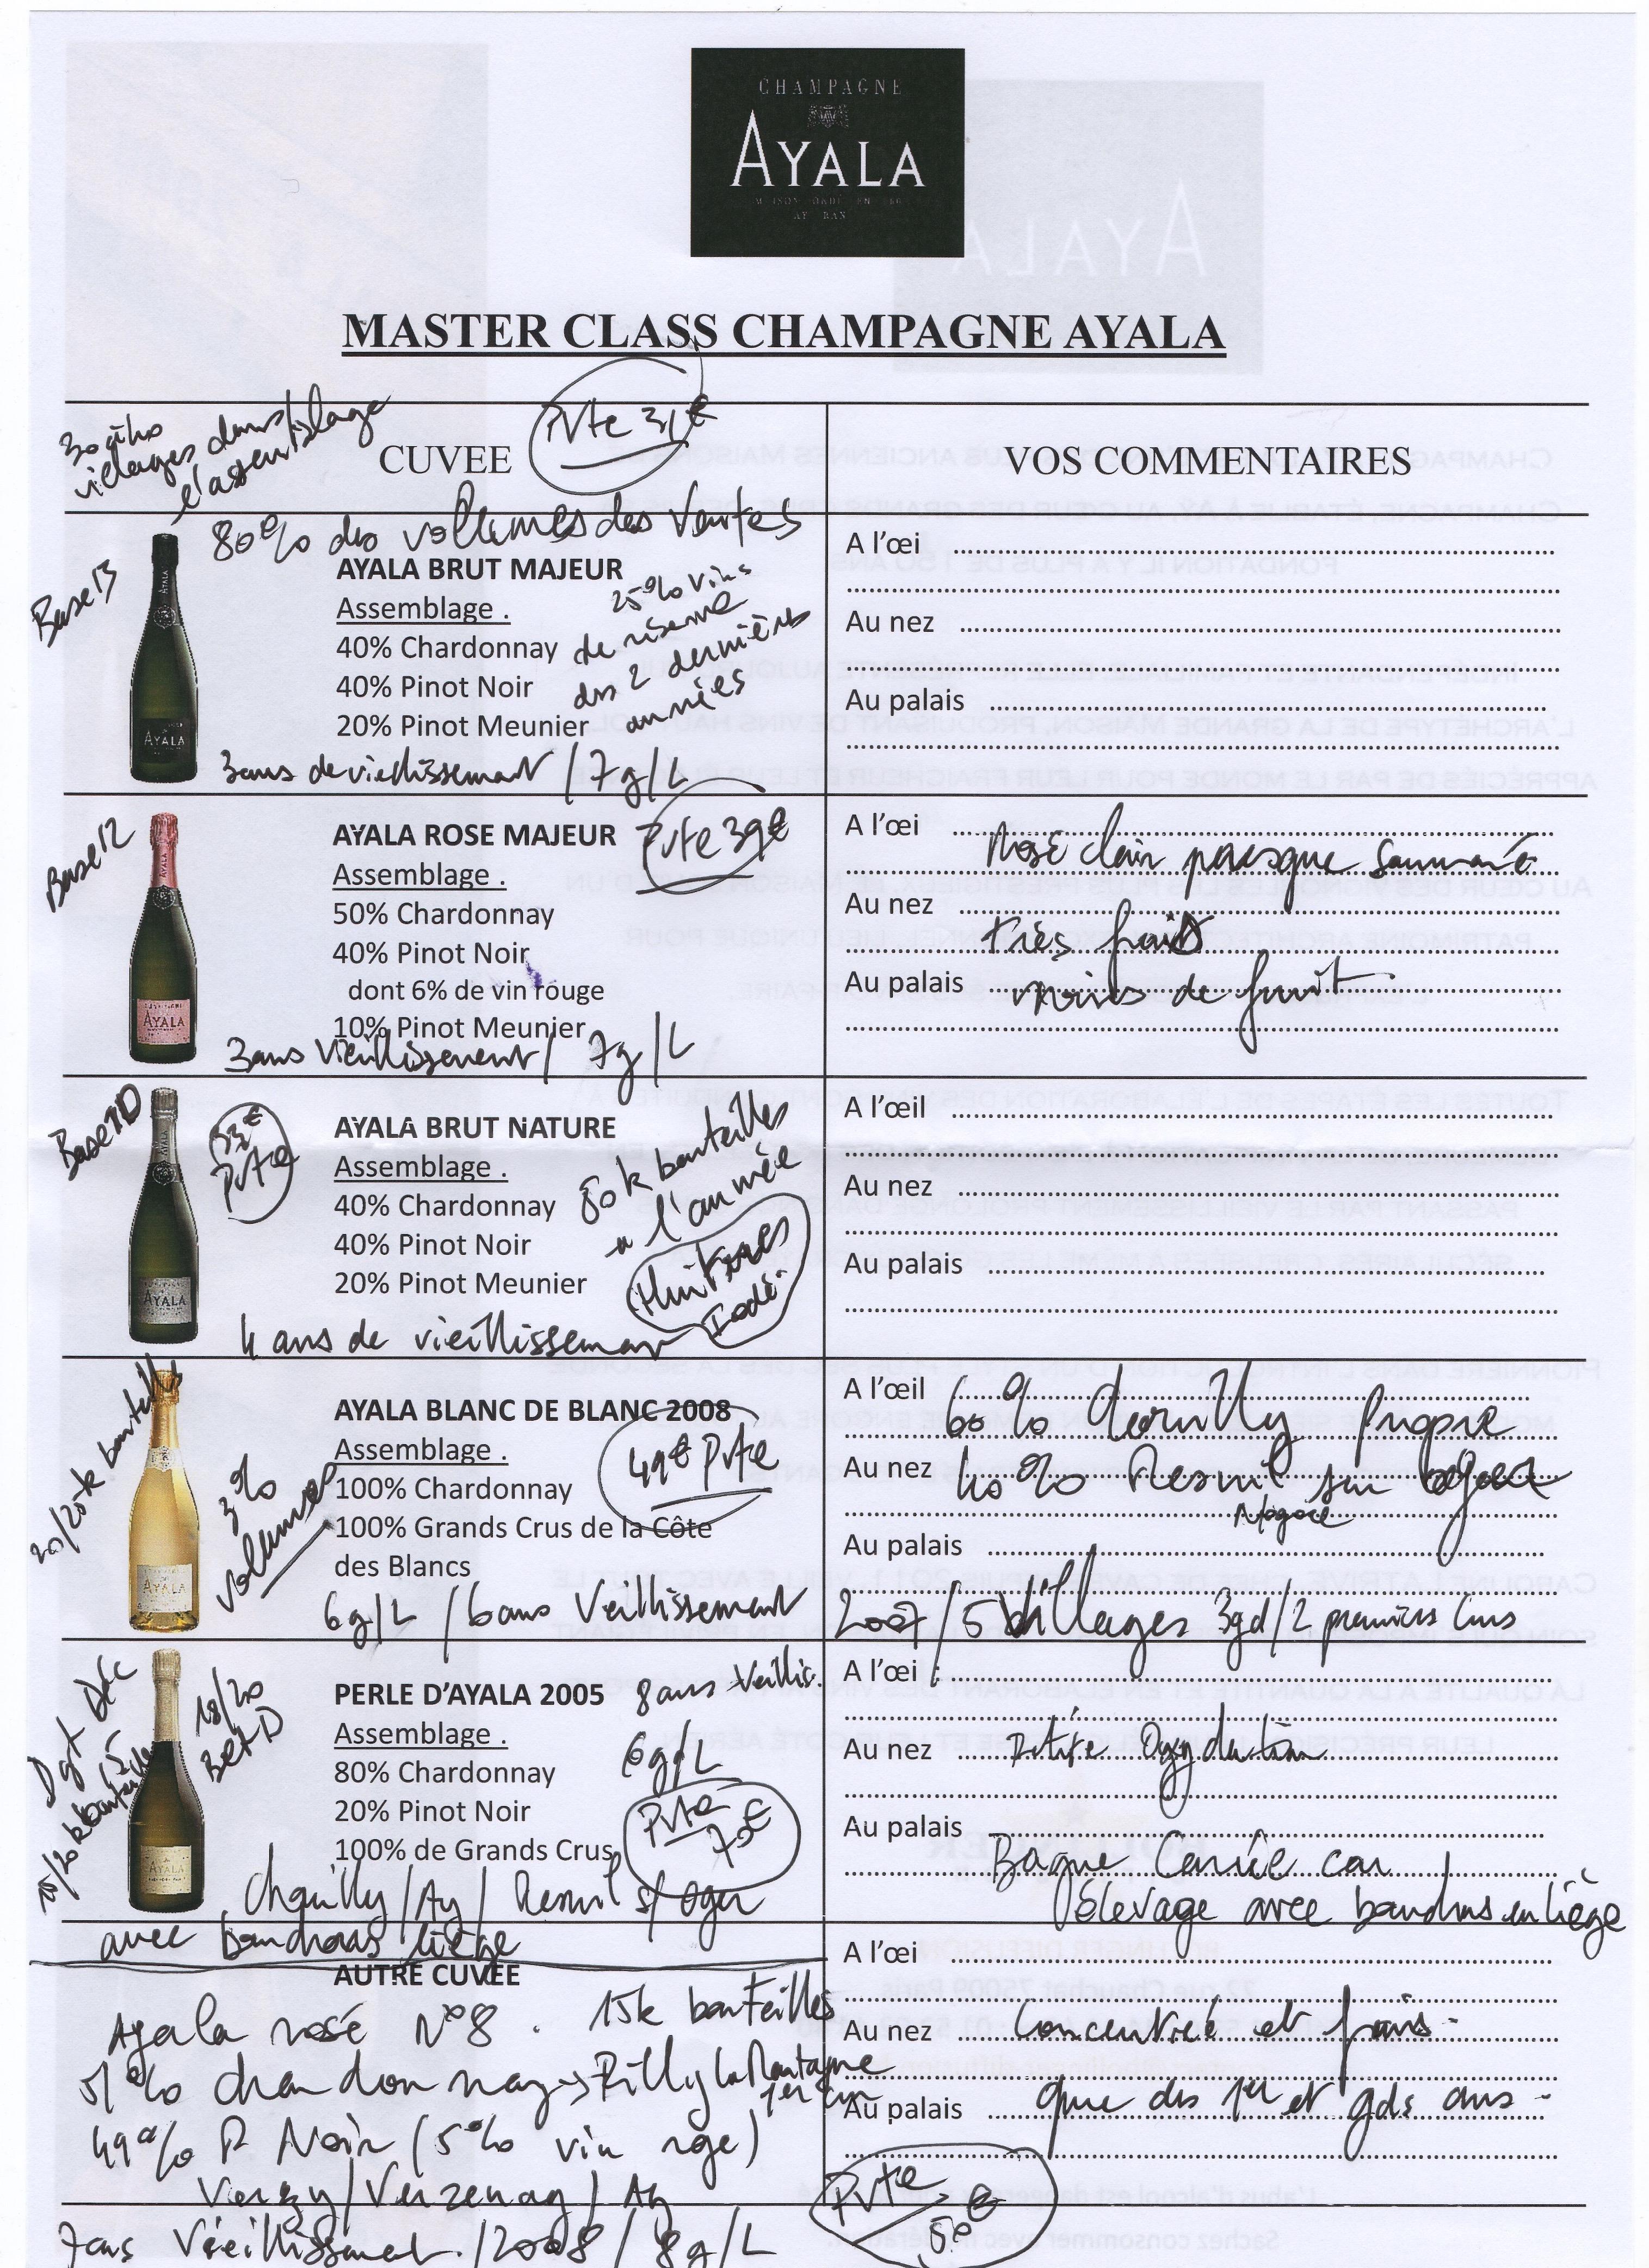 Notes des champagnes Ayala dégustés ce matin